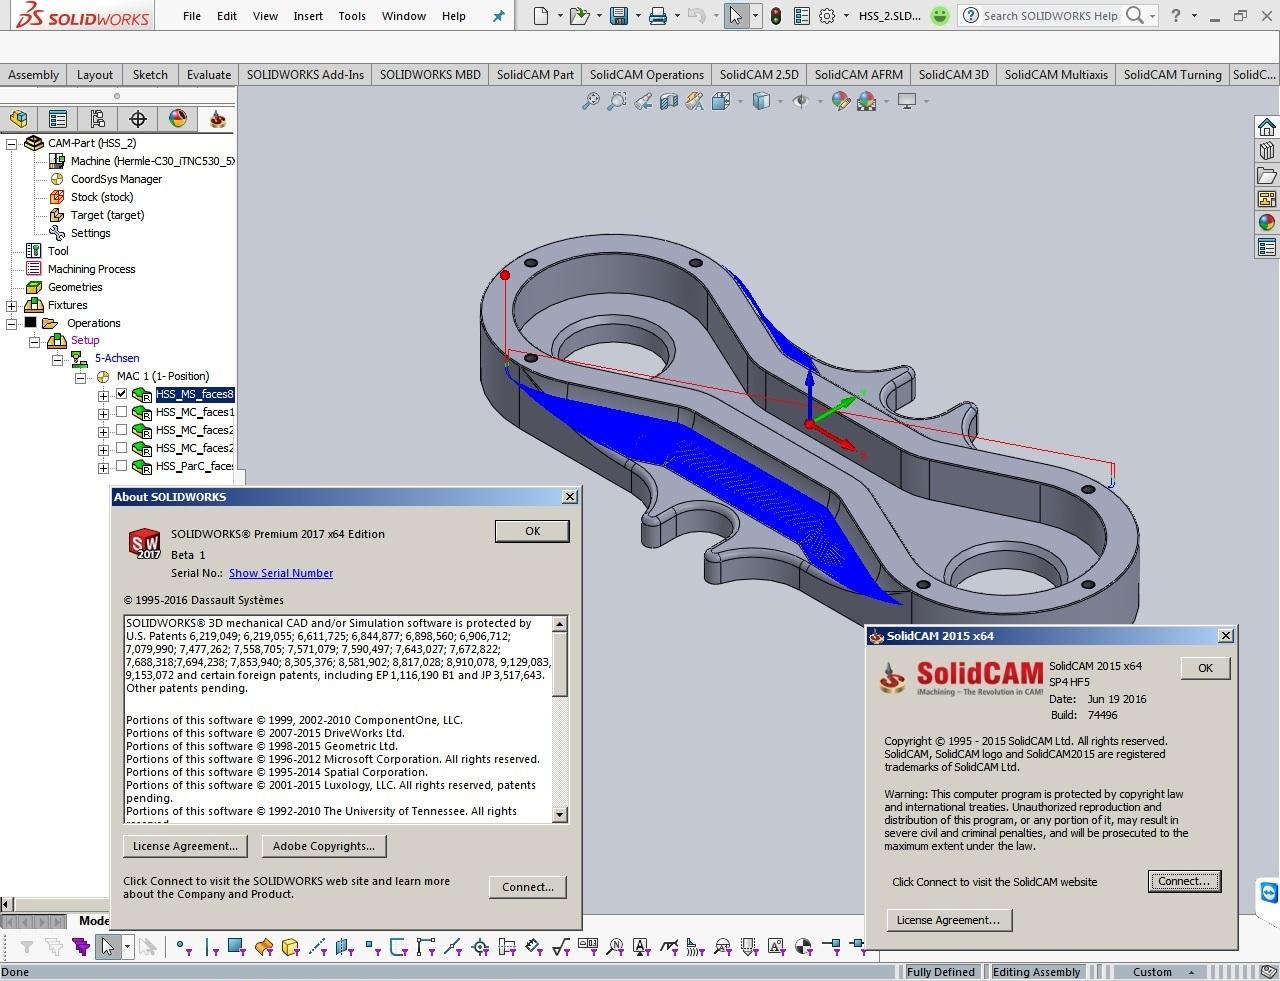 SolidCAM 2015 SP4 HF5 Multilang for SolidWorks 2012-2017 full license